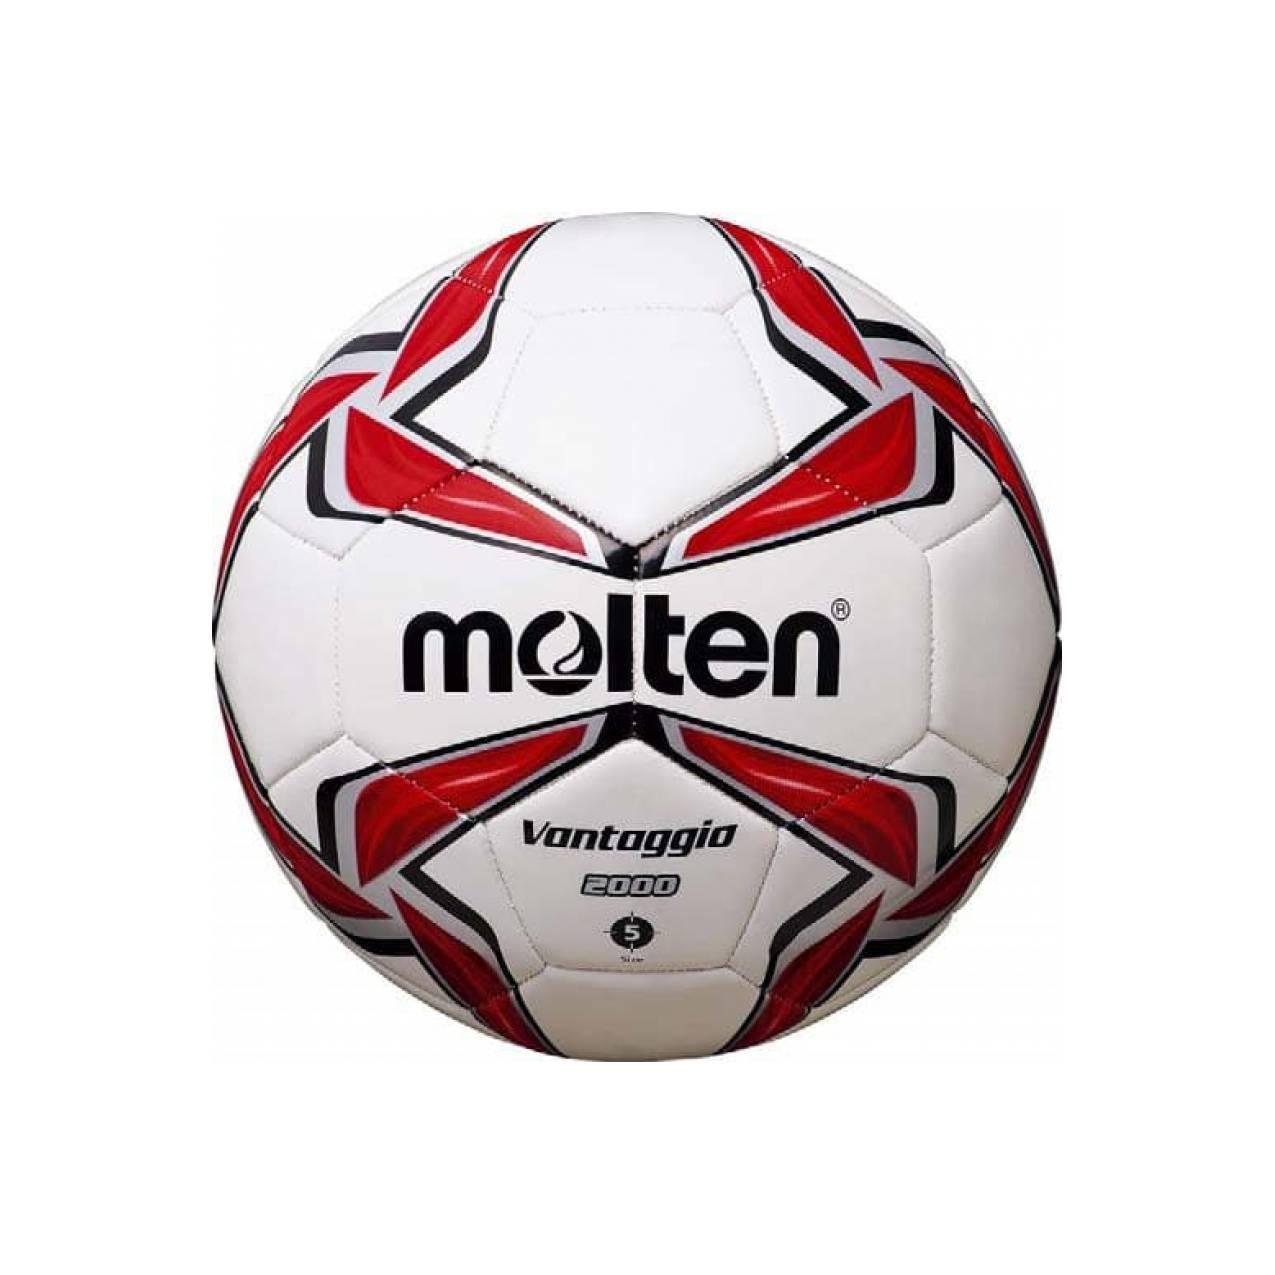 Sepak Bola Molten Vantaggio 1500 Biru Original Daftar Update Harga Source · Bola Kaki Sepak Vantaggio F5V 2000 MOLTEN Original